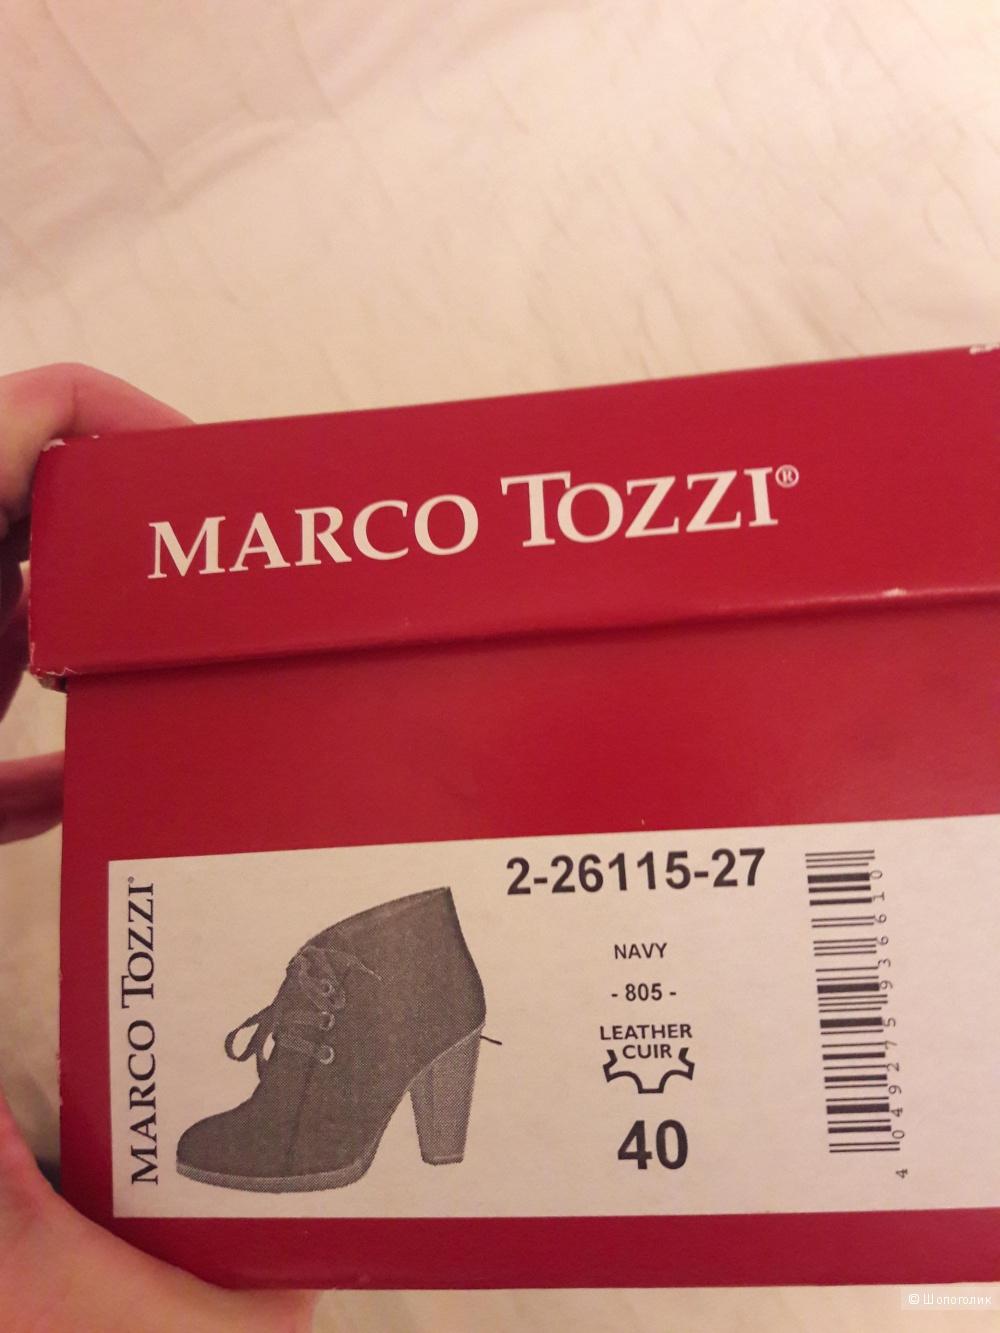 Marco Tozzi: ботильоны на меху, 40